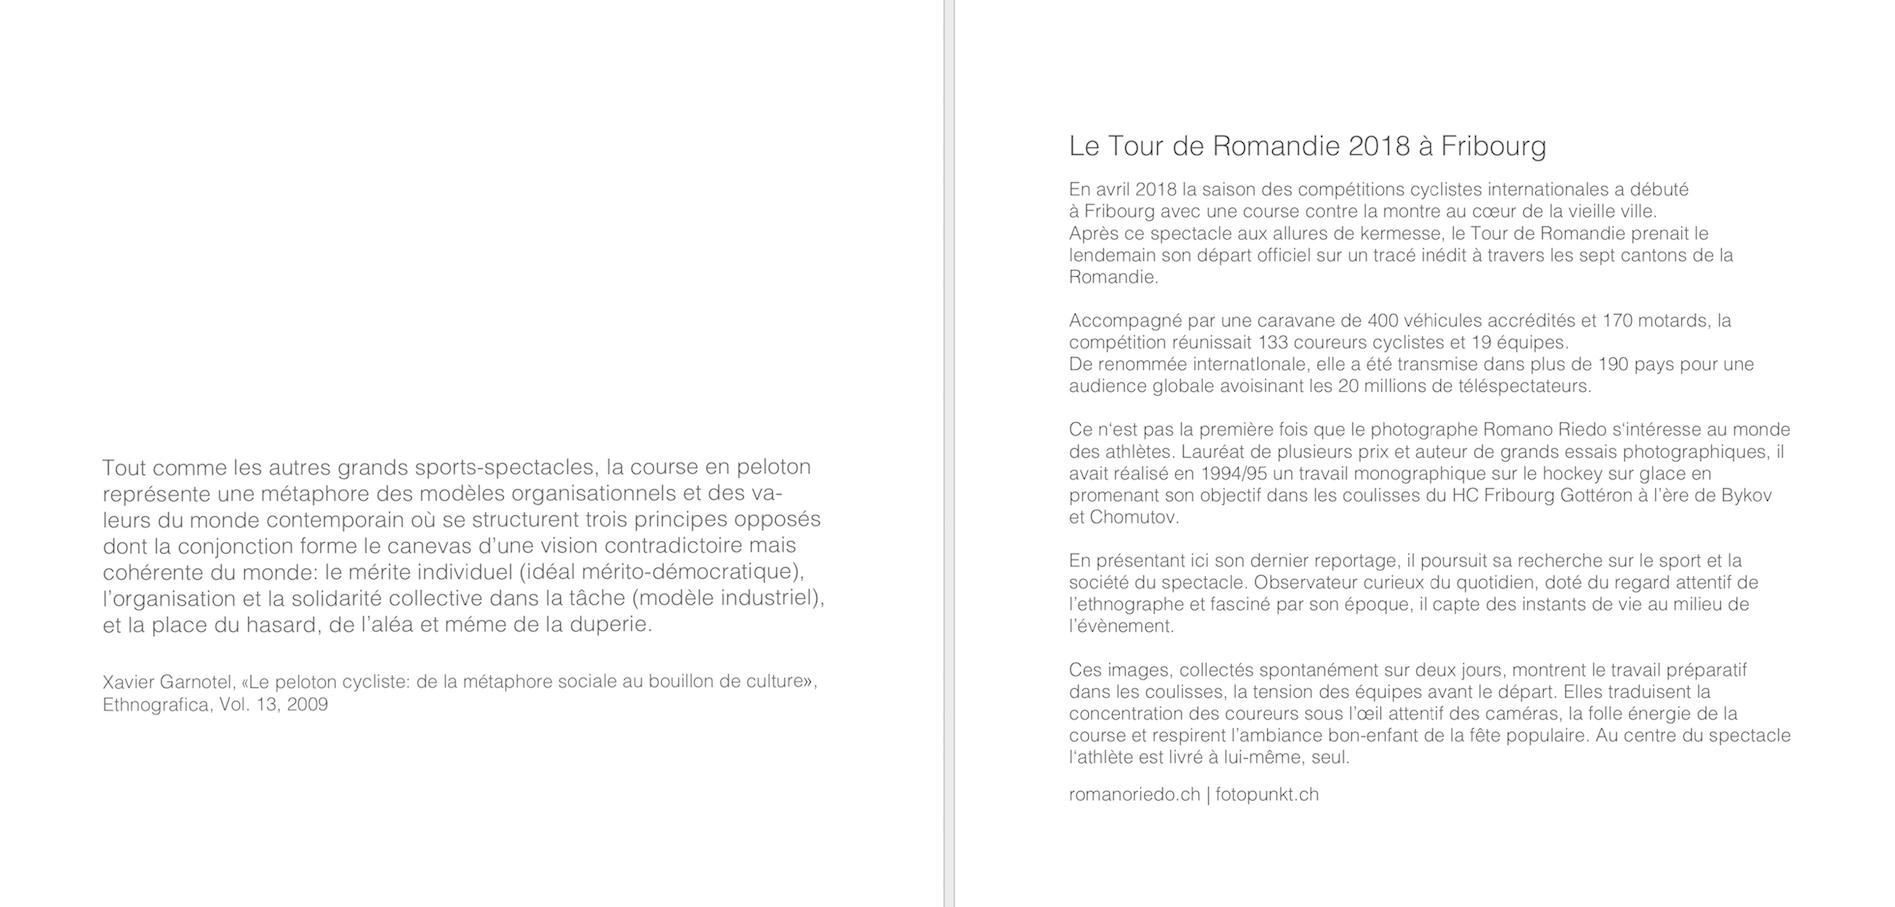 http://www.romanoriedo.ch/files/gimgs/1_text-coontre-la-montre-m.png